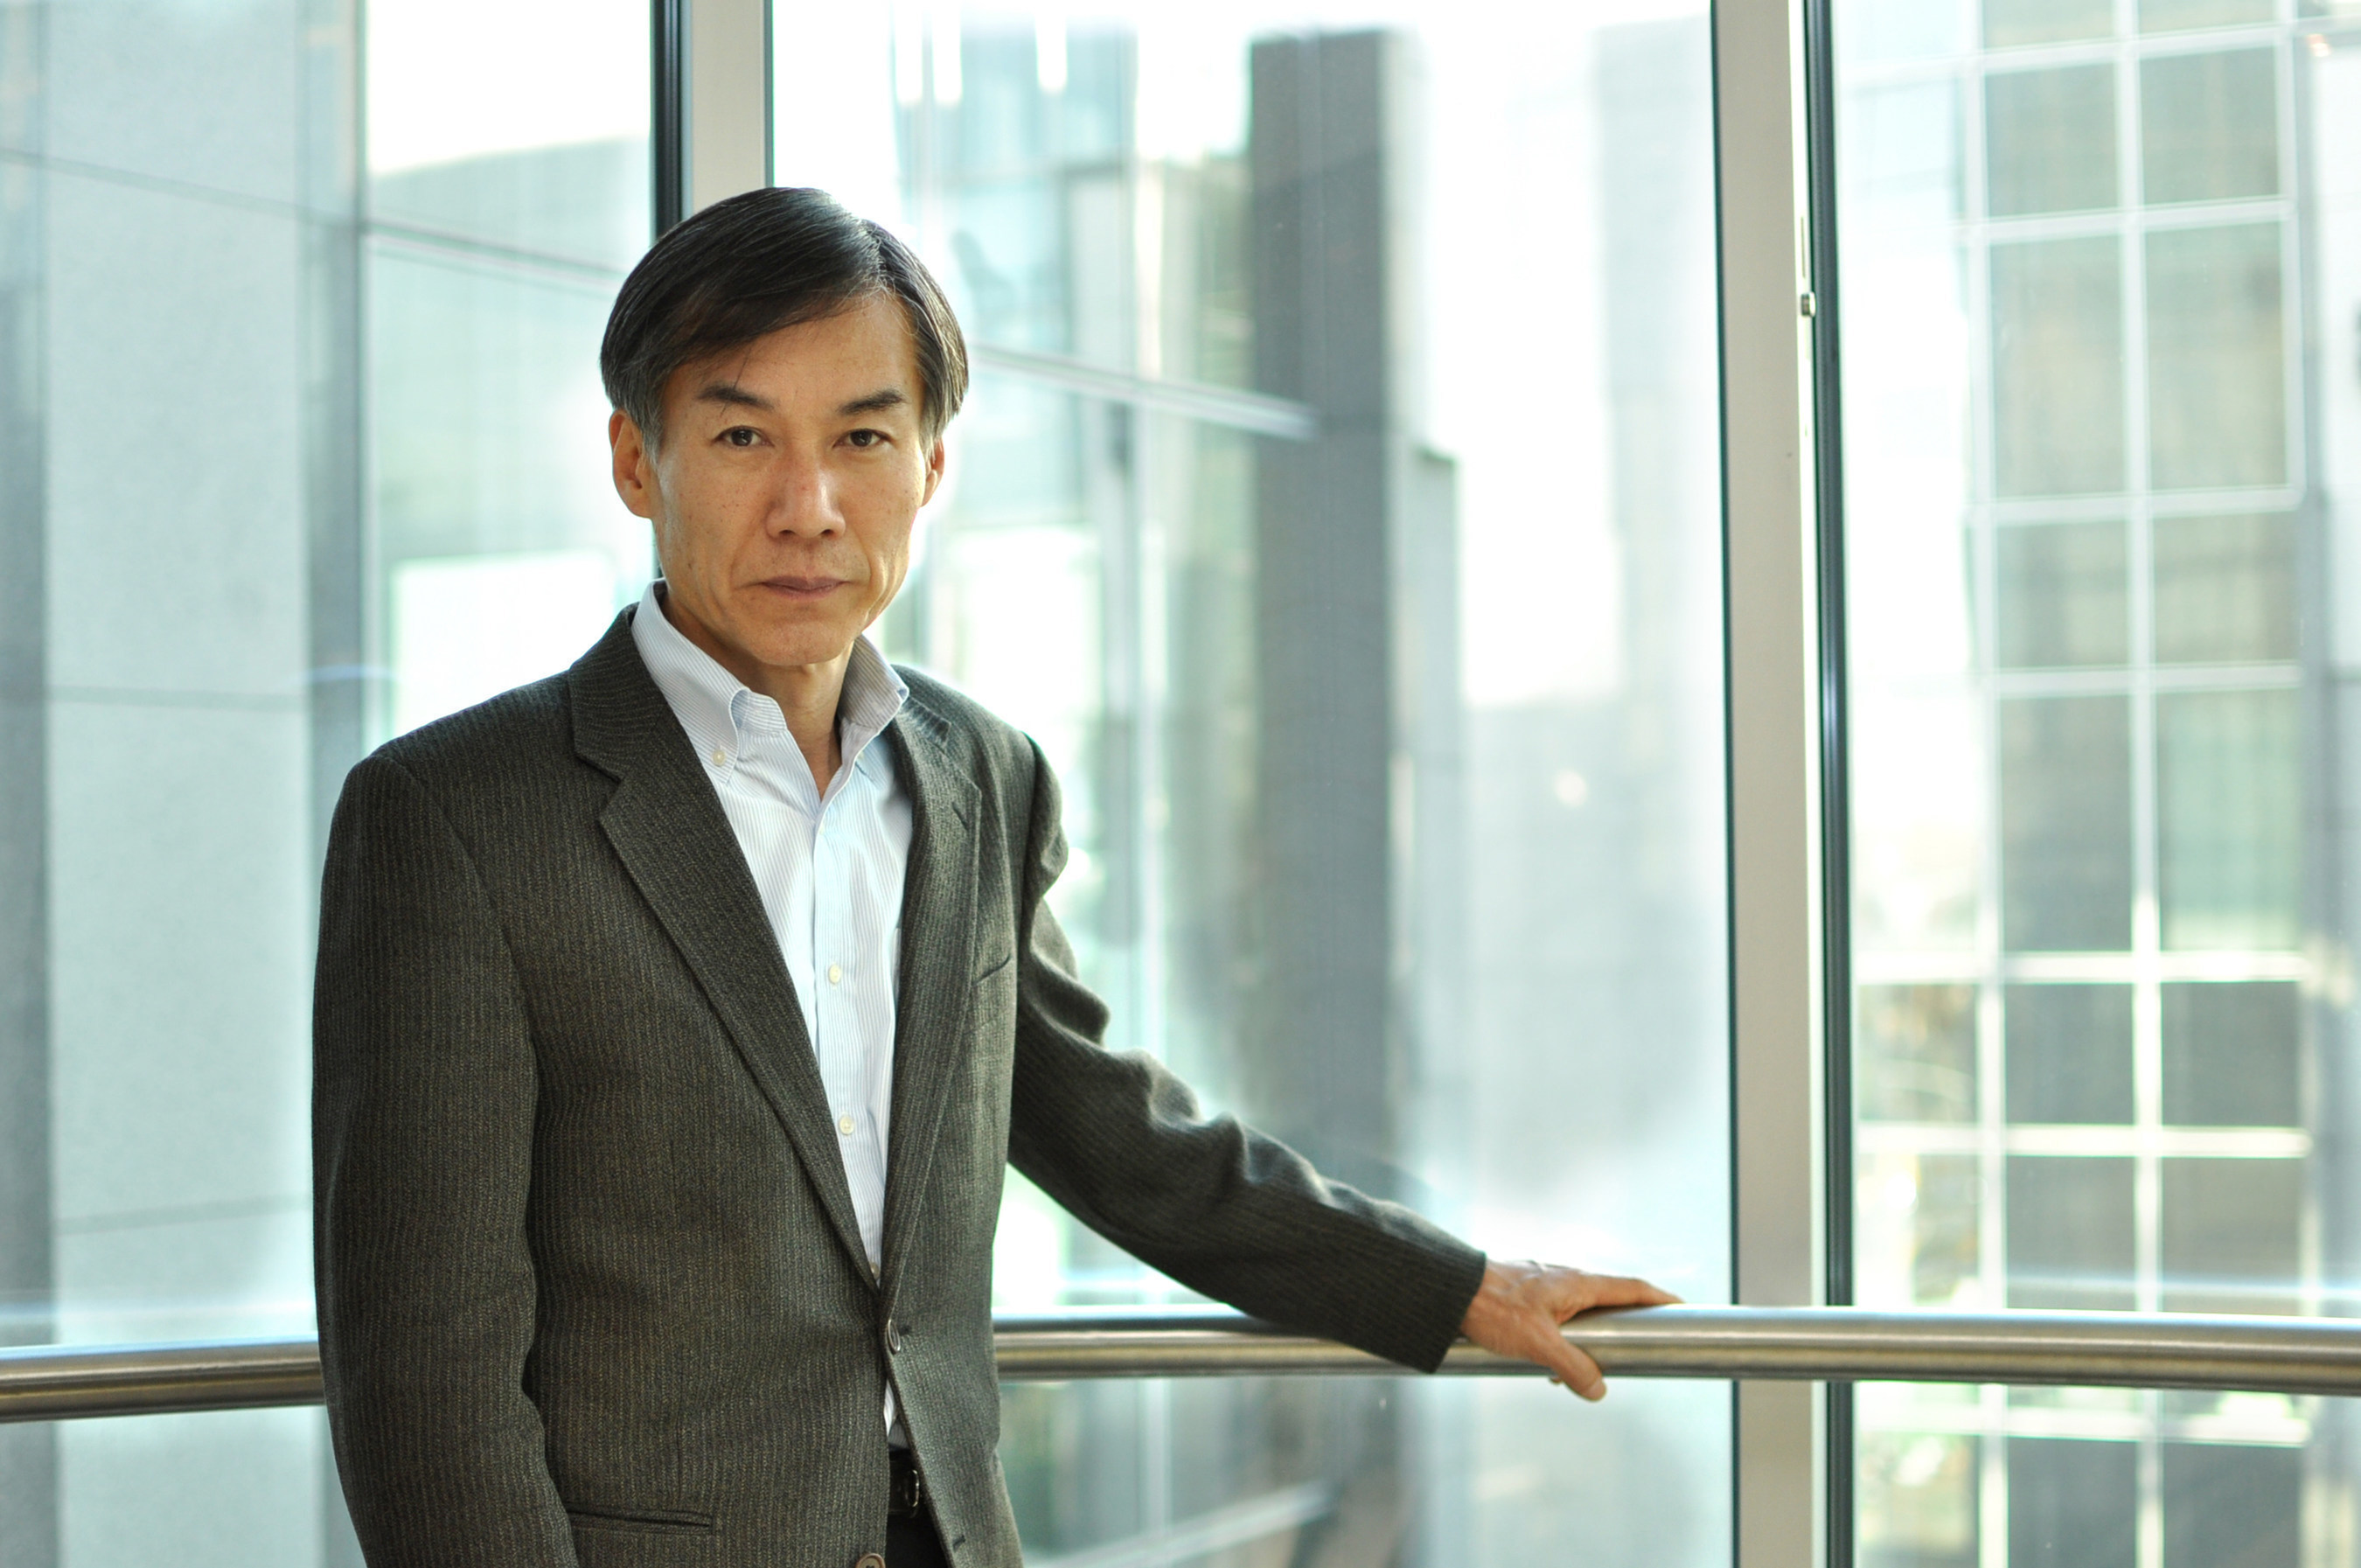 SoftKinetic Announces Akihiro Hasegawa as New CEO